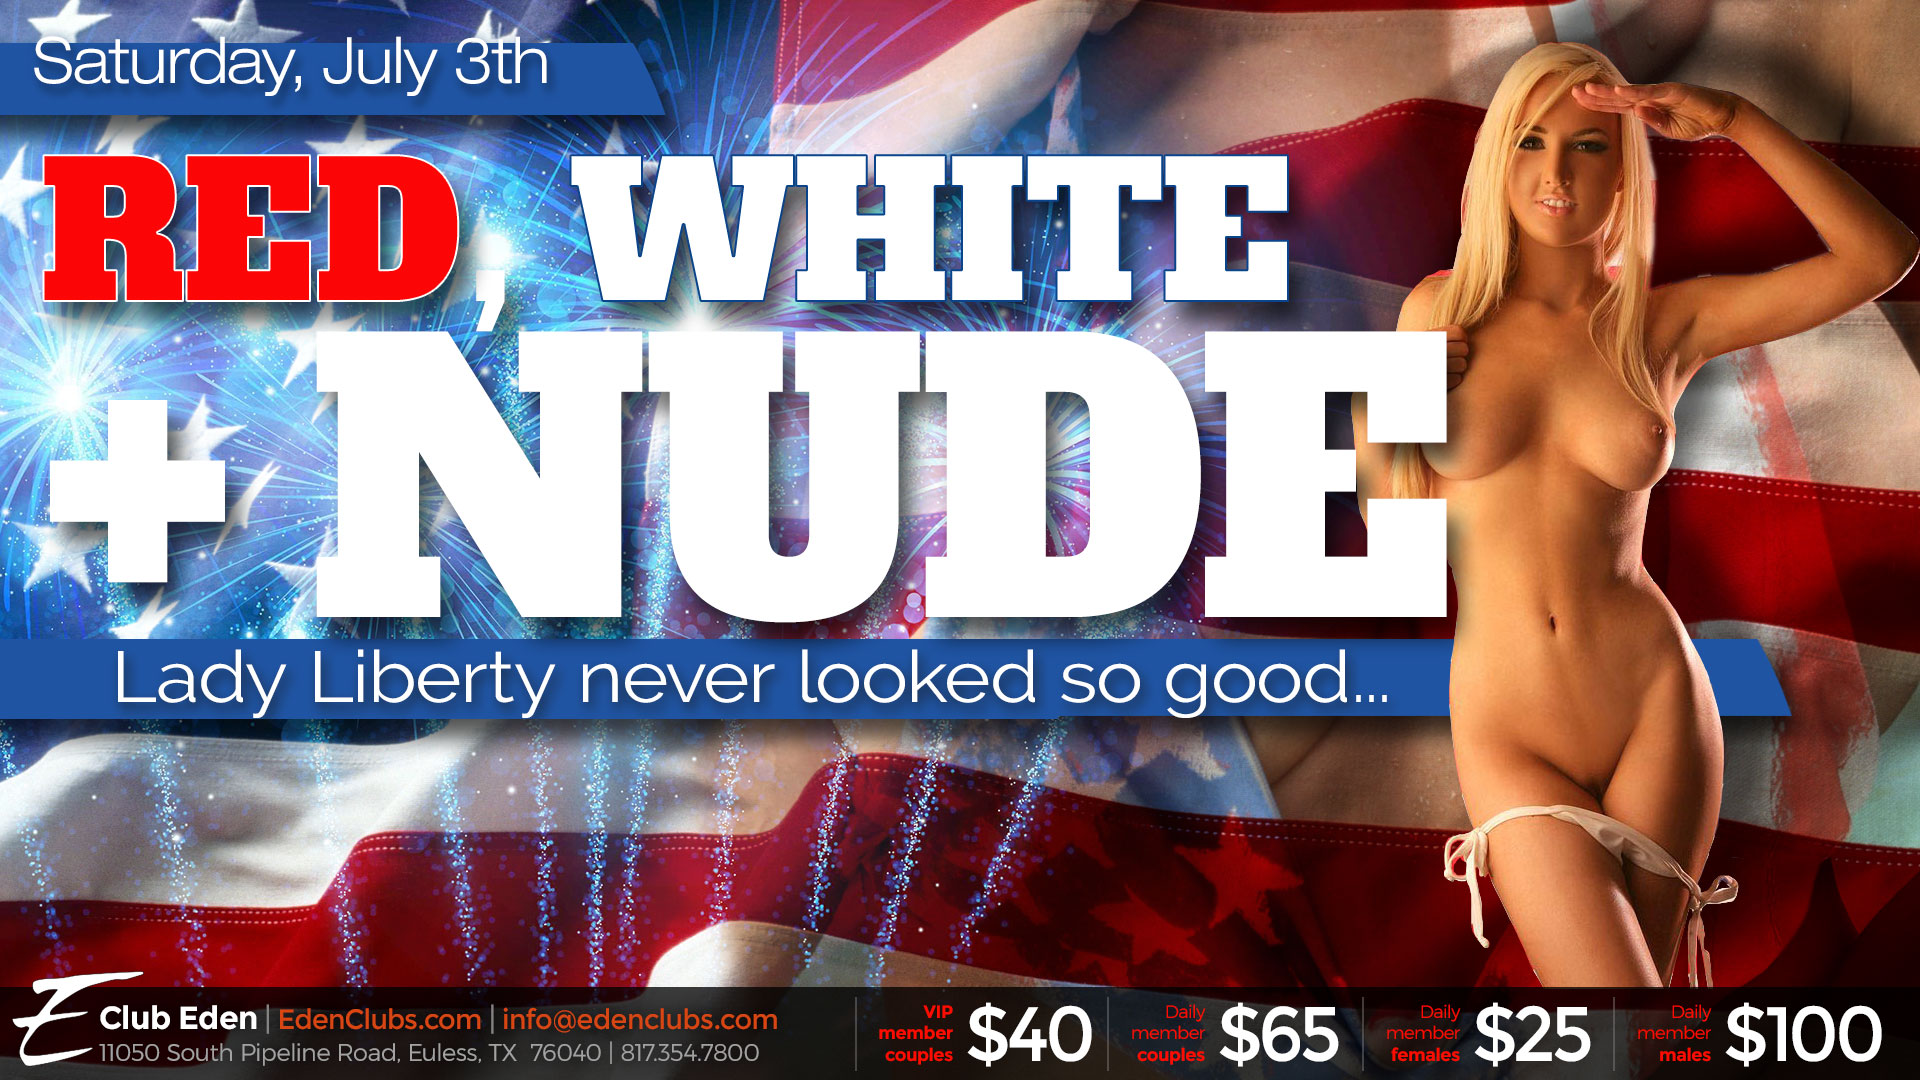 070321-Red-Hot-Nude-eden-dfw-tv